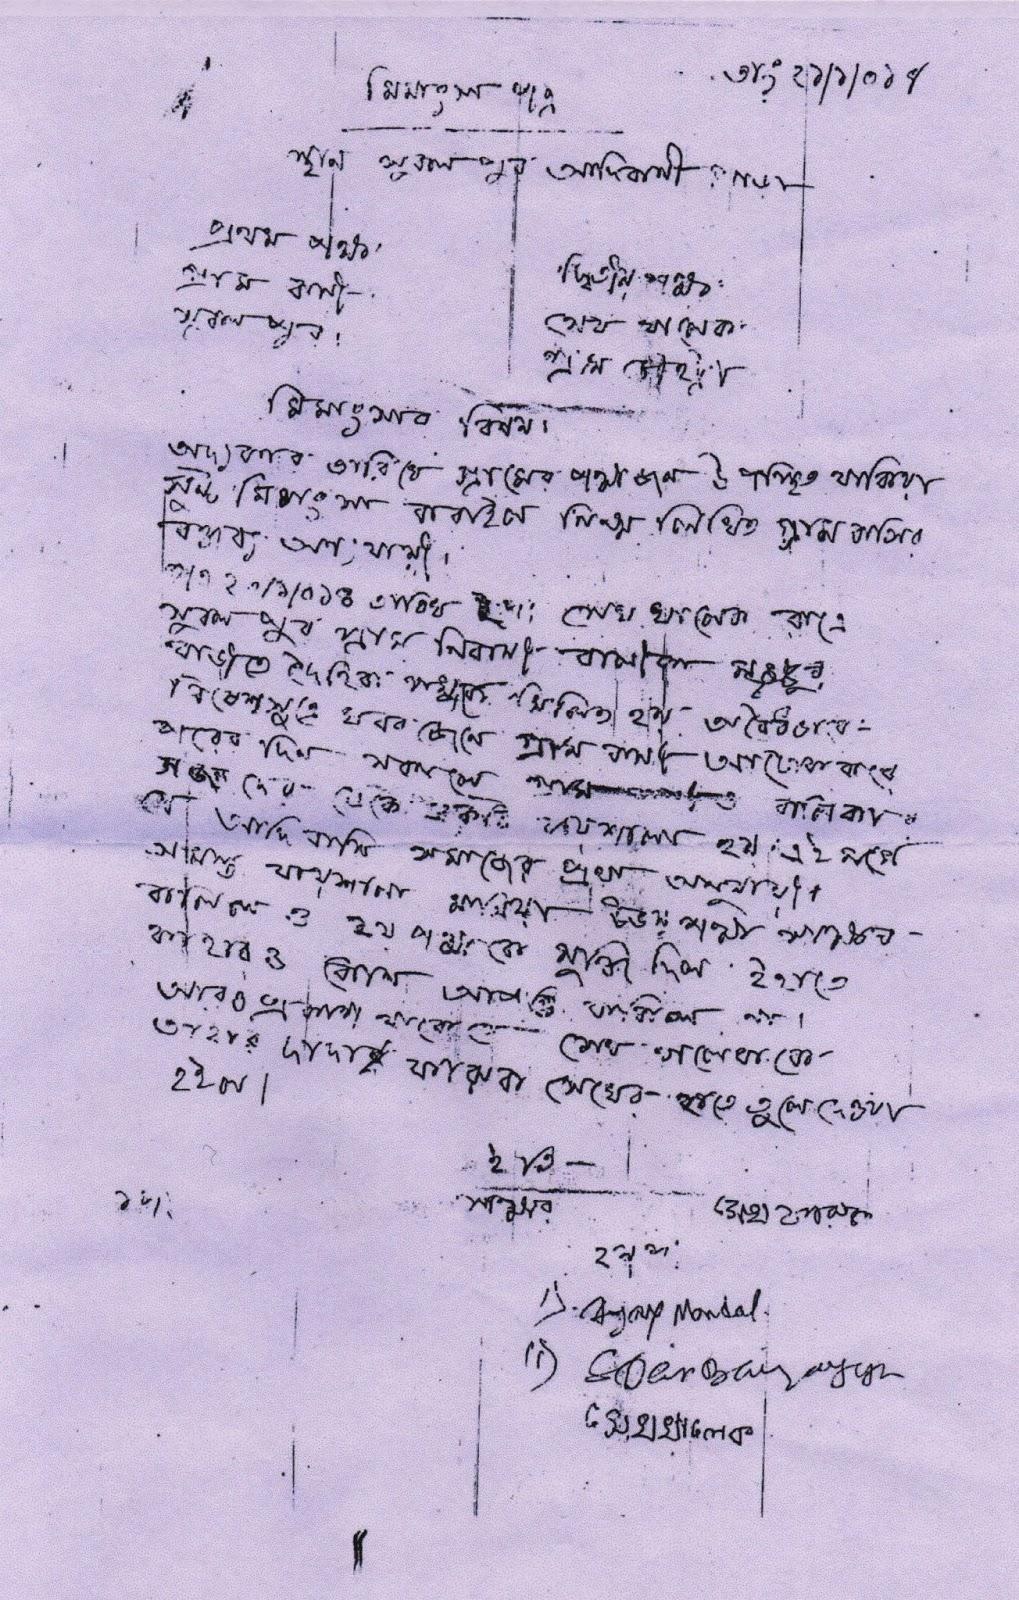 Birbhum Rape Case Proof- Decision by Gram Sabha to get them married (no mention of rape)